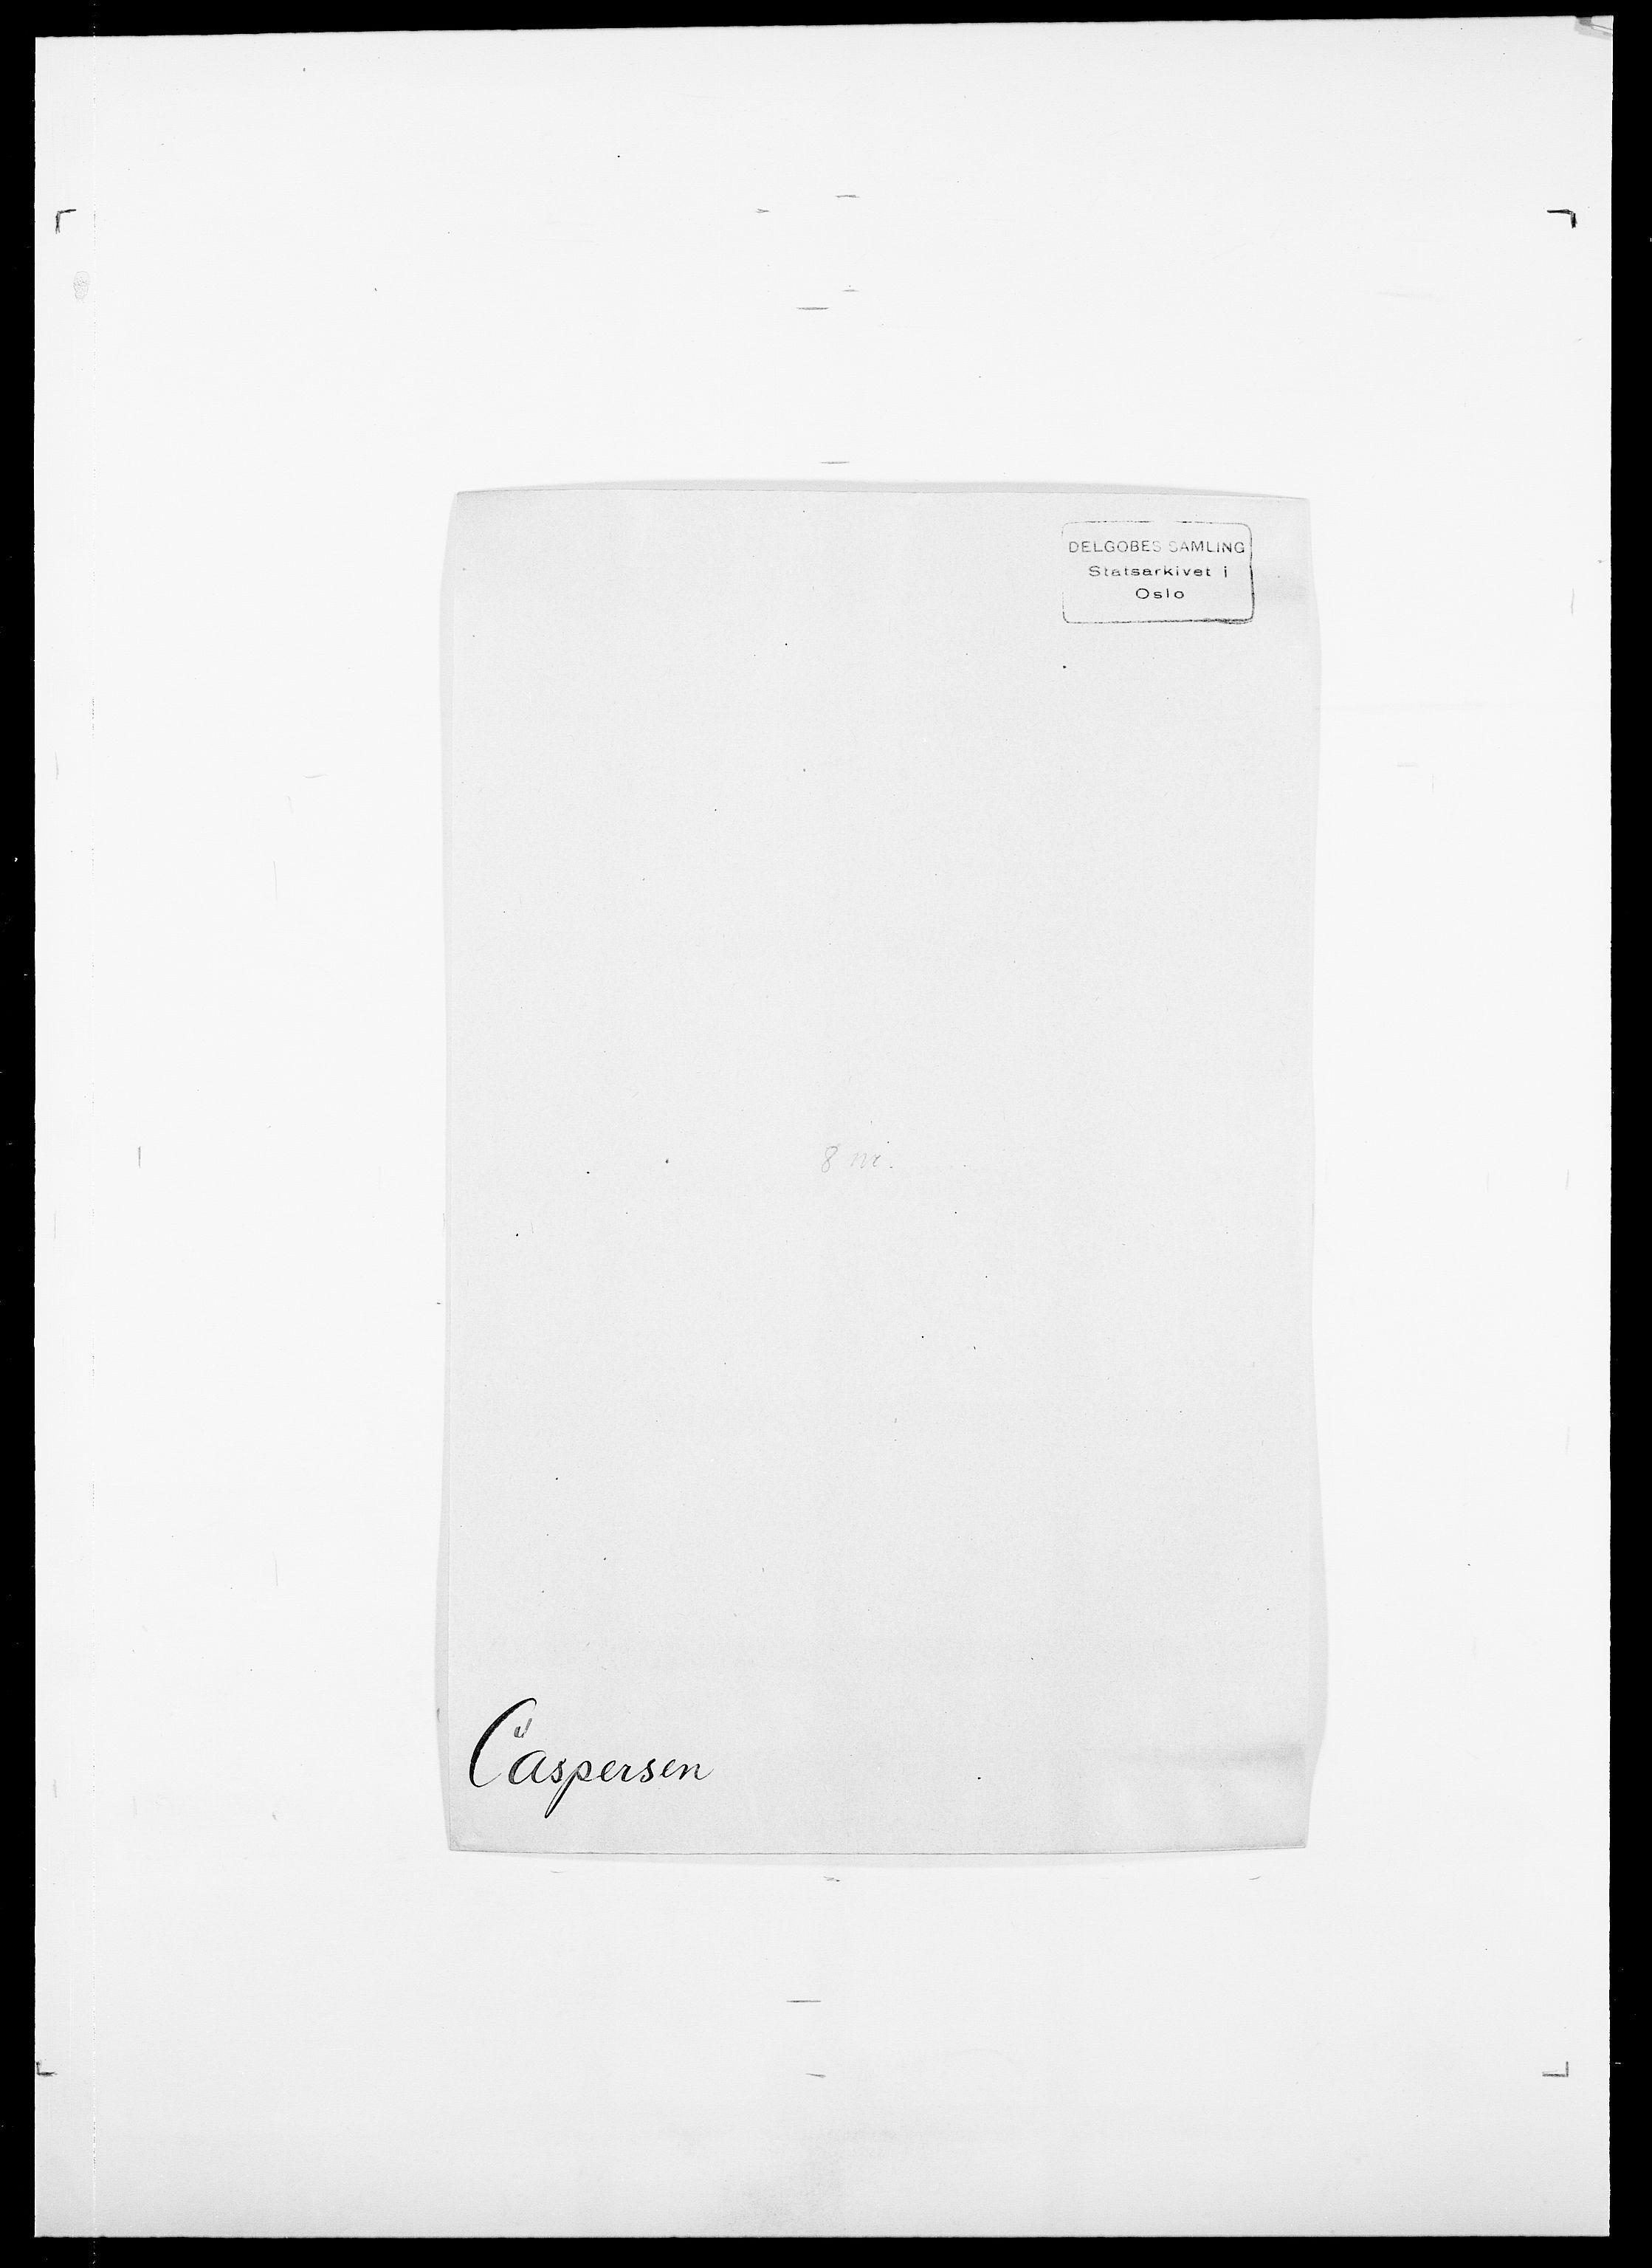 SAO, Delgobe, Charles Antoine - samling, D/Da/L0008: Capjon - Dagenbolt, s. 120